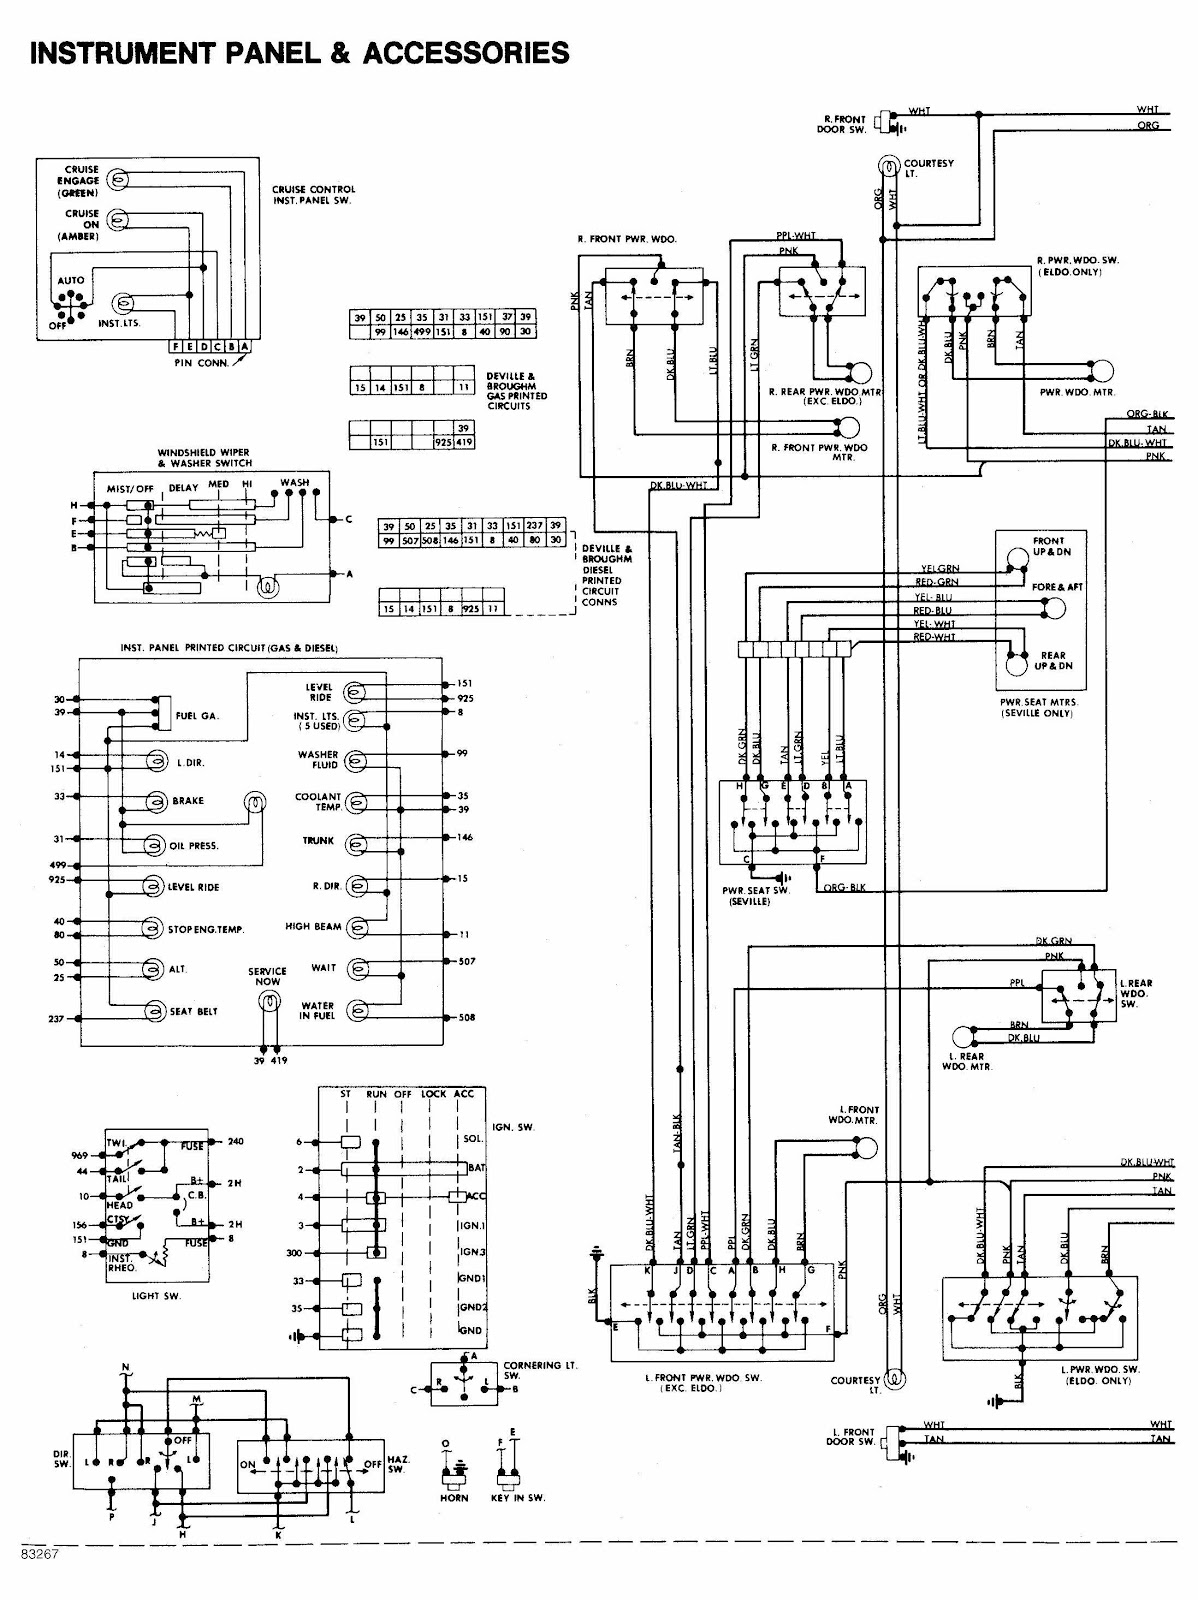 1967 mustang instrument cluster wiring diagram 94 mustang 1966 mustang wiring diagram 1967 mustang alternator wiring [ 1198 x 1600 Pixel ]